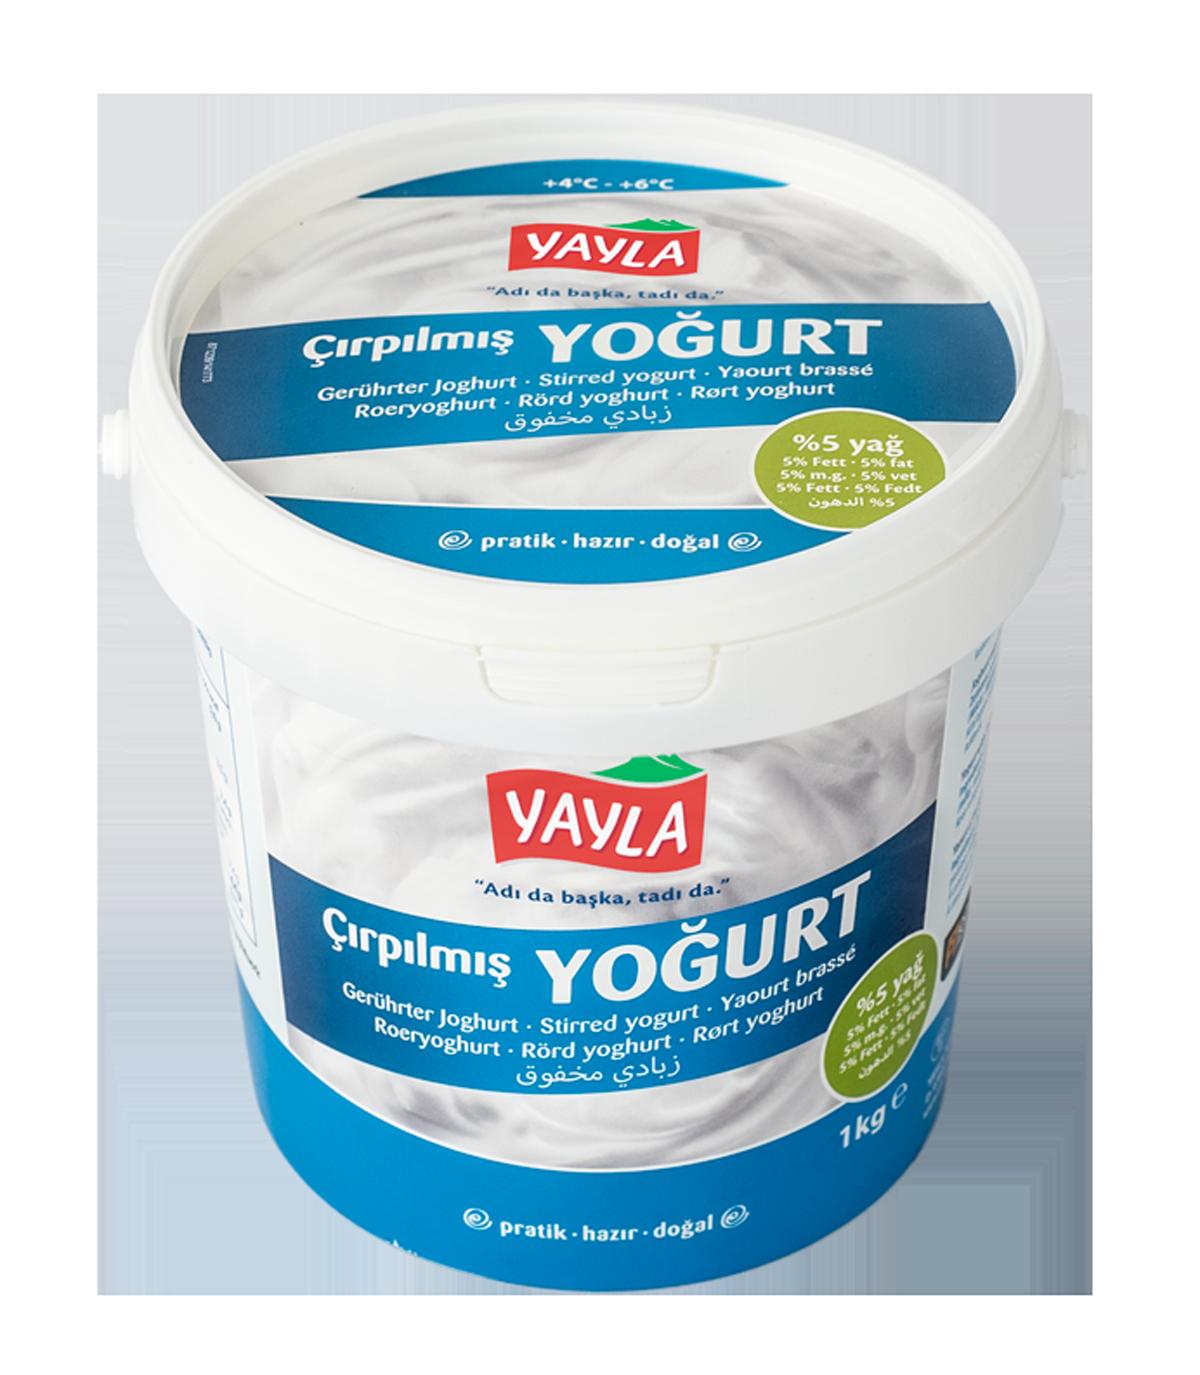 Yayla | Joghurt, gerührt (5% Fett)